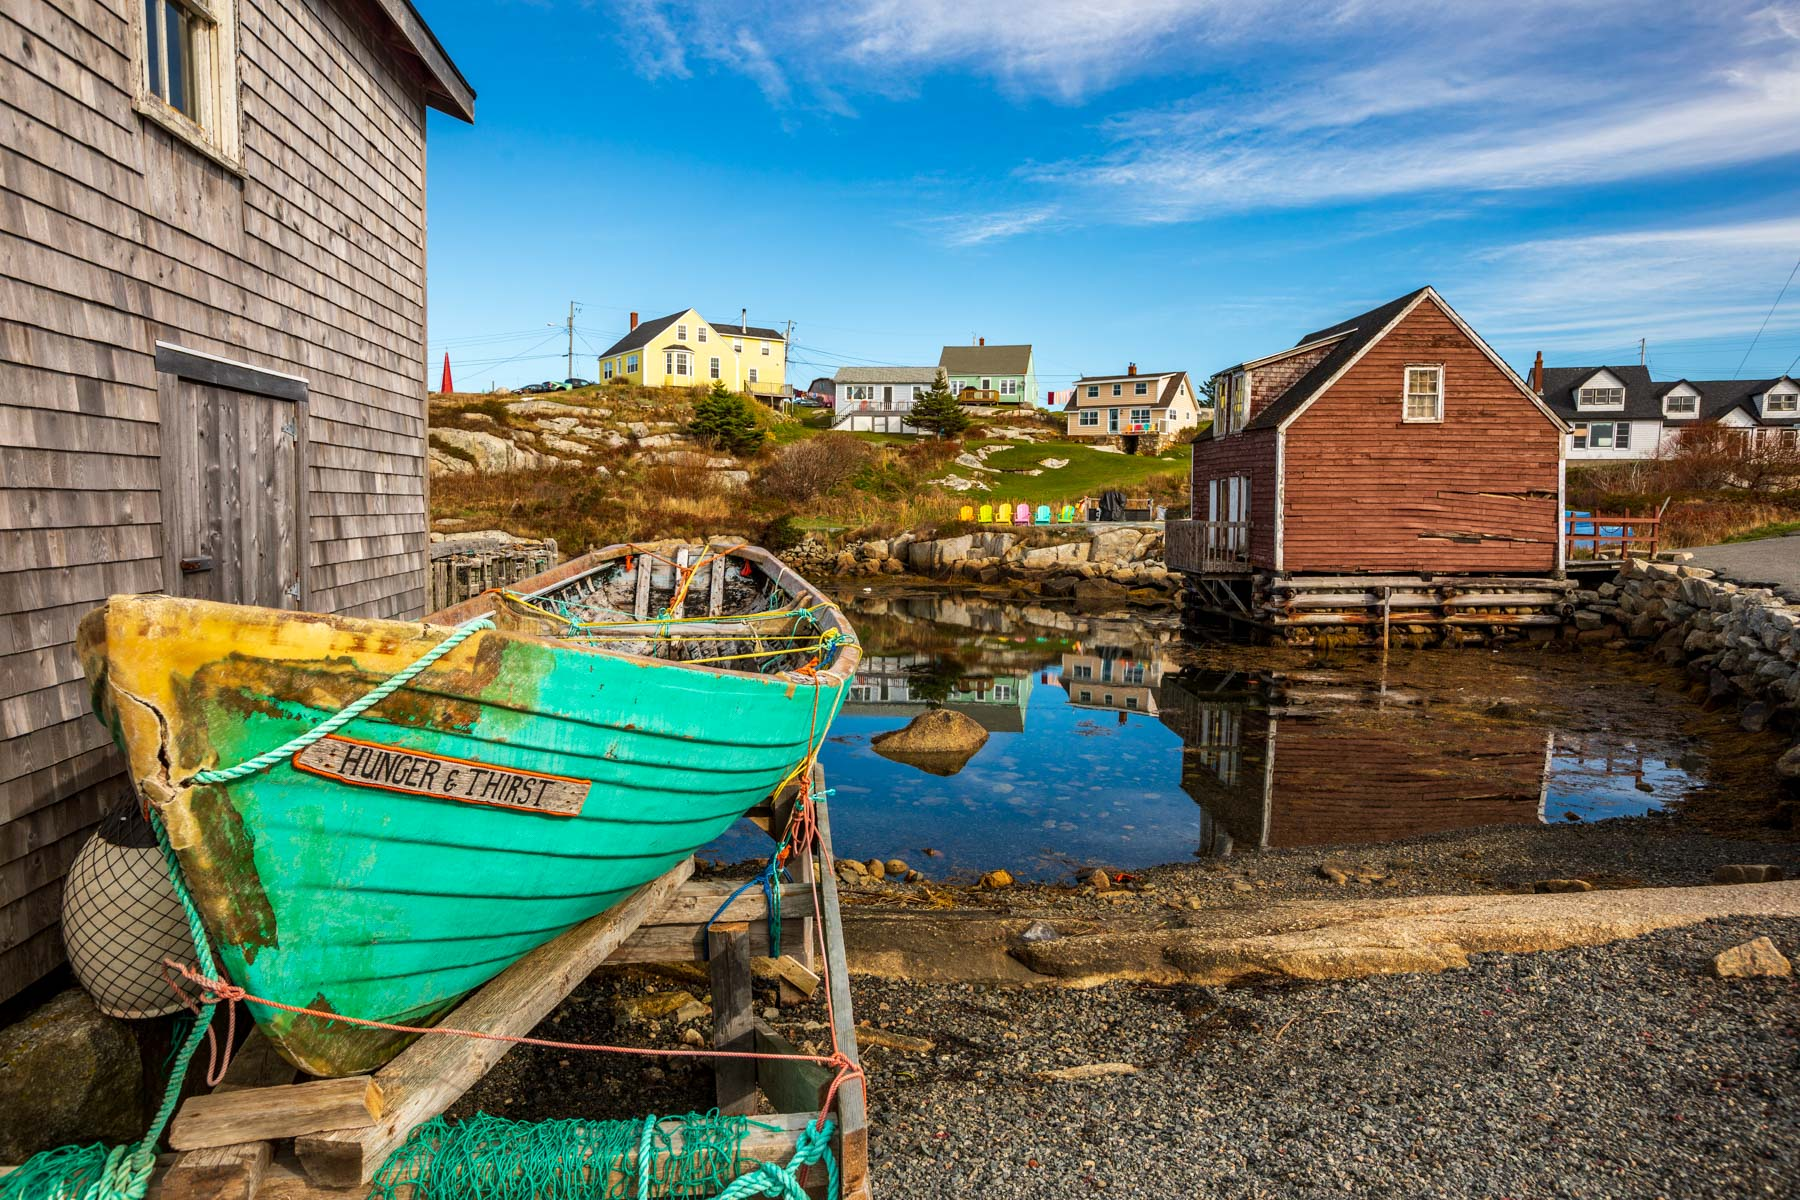 Old Fishing boat, fishing village, Peggy's Cove, Nova Scotia, Canada